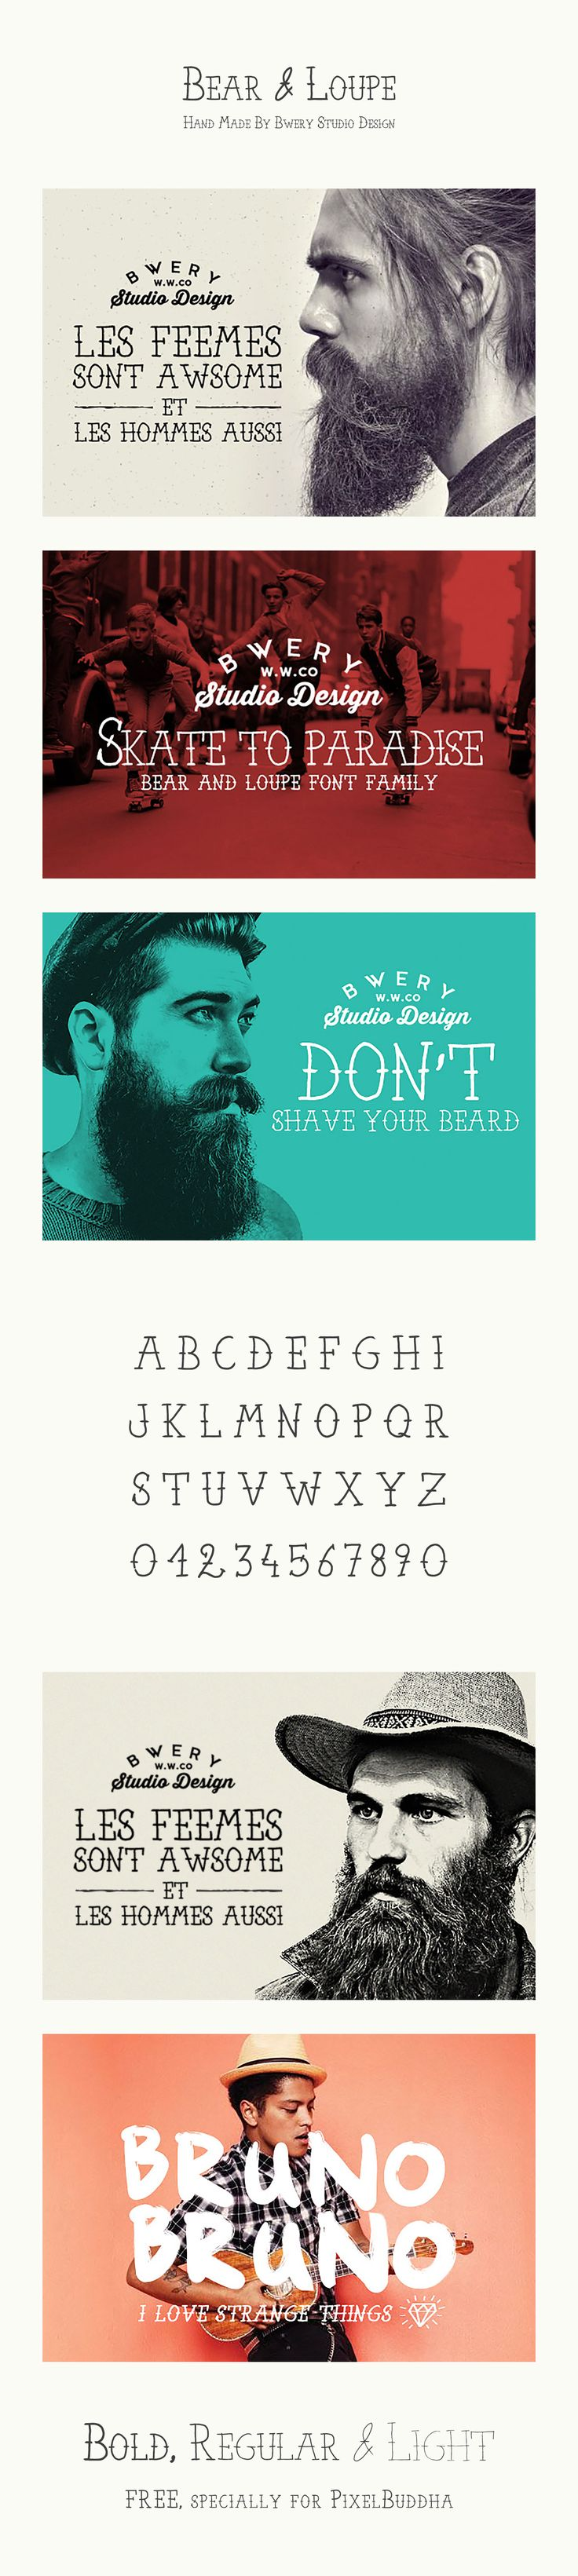 Bear & Loupe Font Family - free fonts